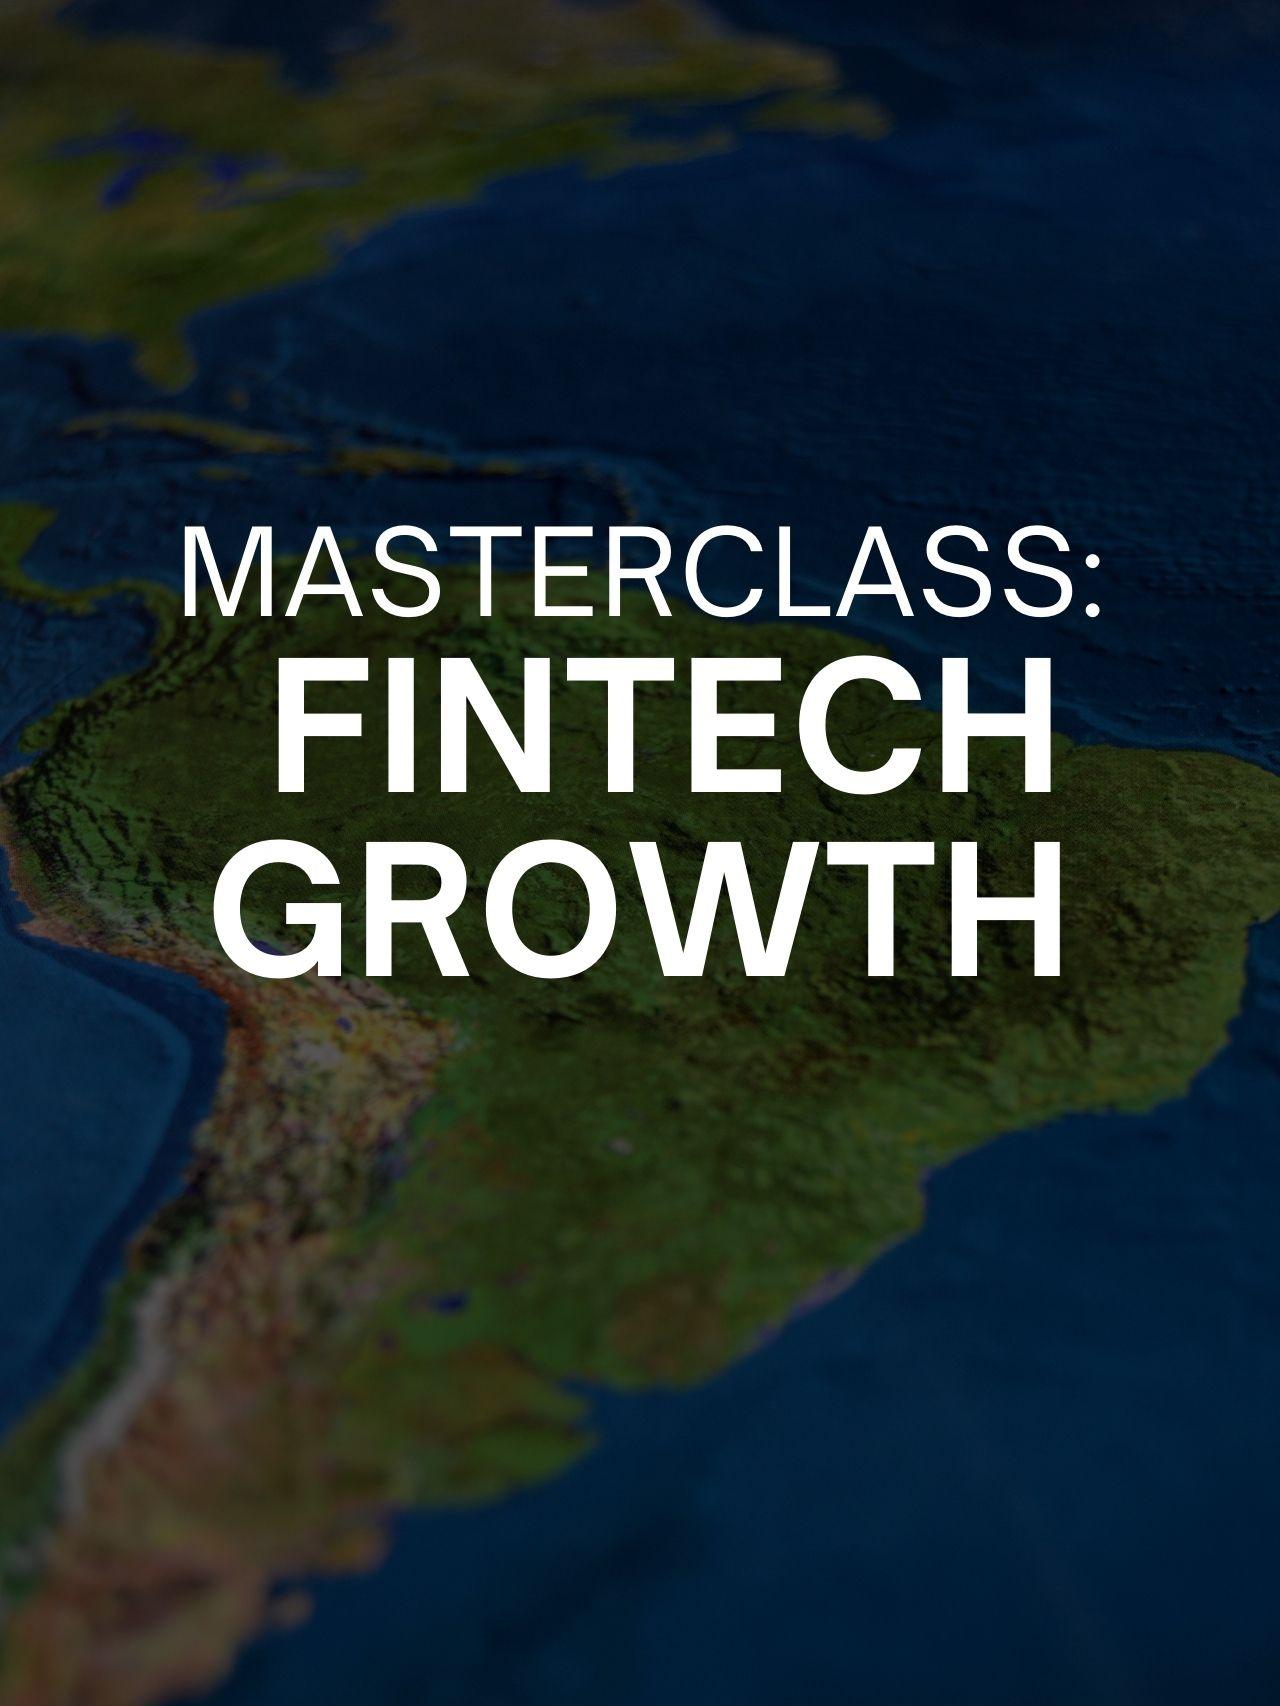 Masterclass: Internationalizing fintech - Strategies and challenges